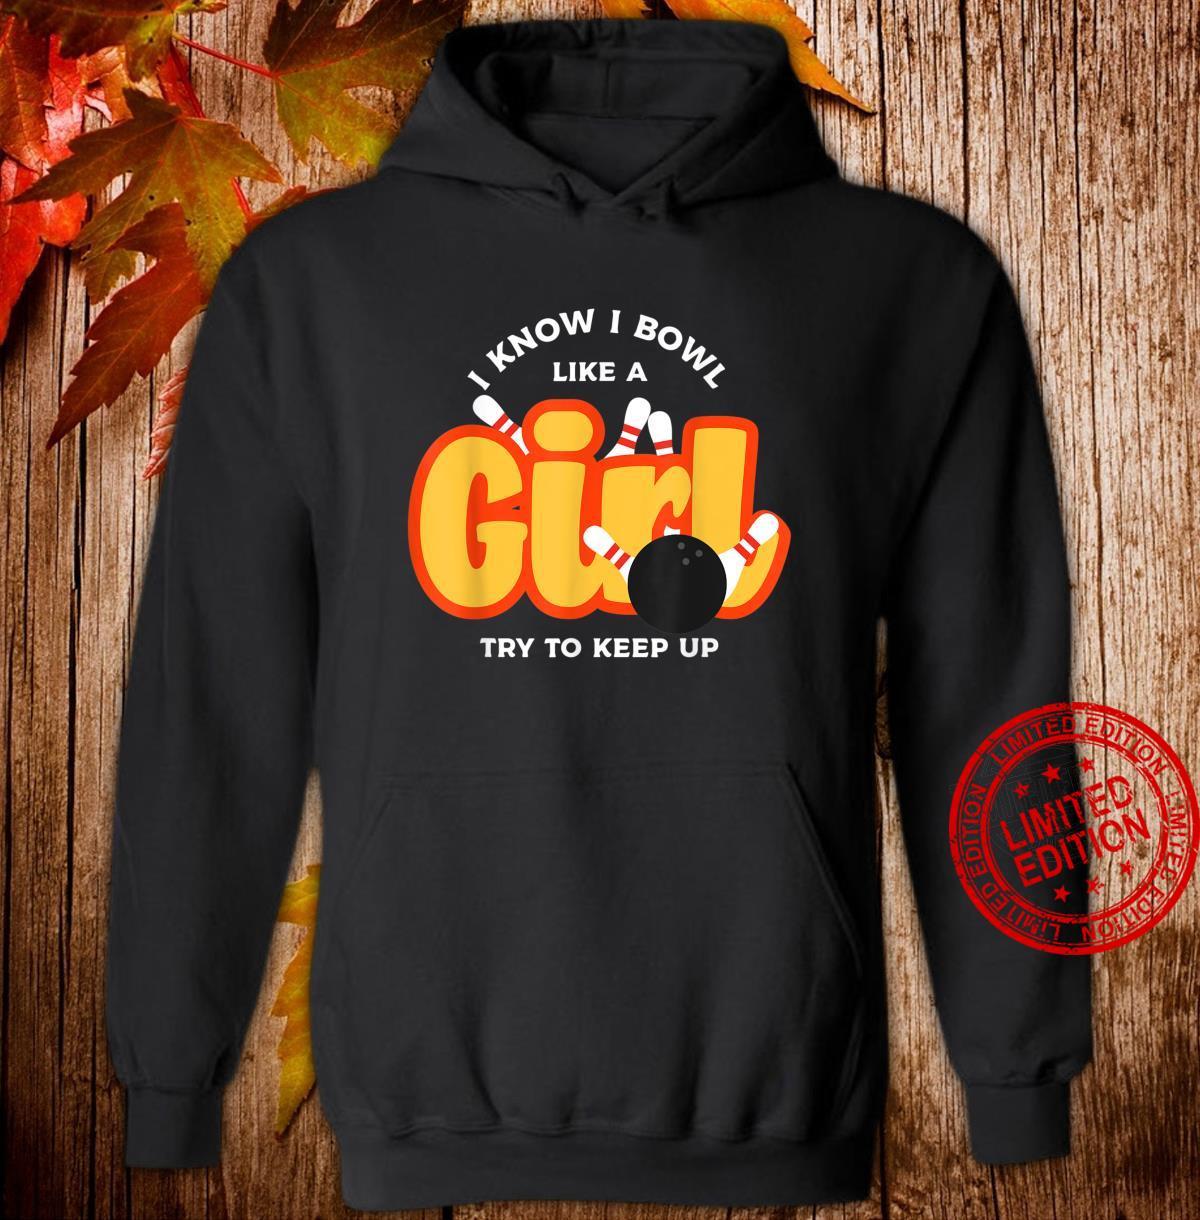 I Bowl Like a GirlColourful Bowling Shirt For Gir Shirt hoodie